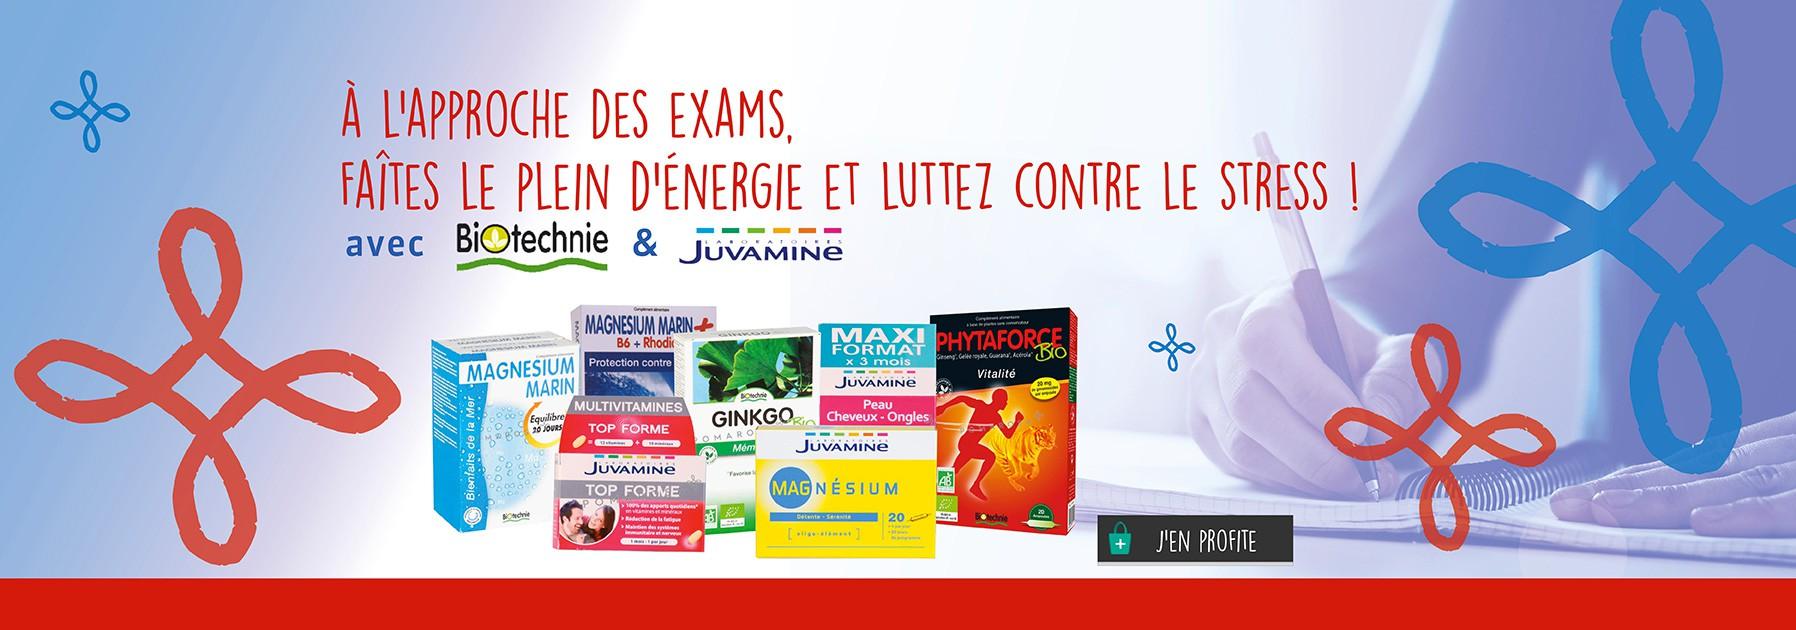 Produits Juvamine et Biotechnie spécial exams